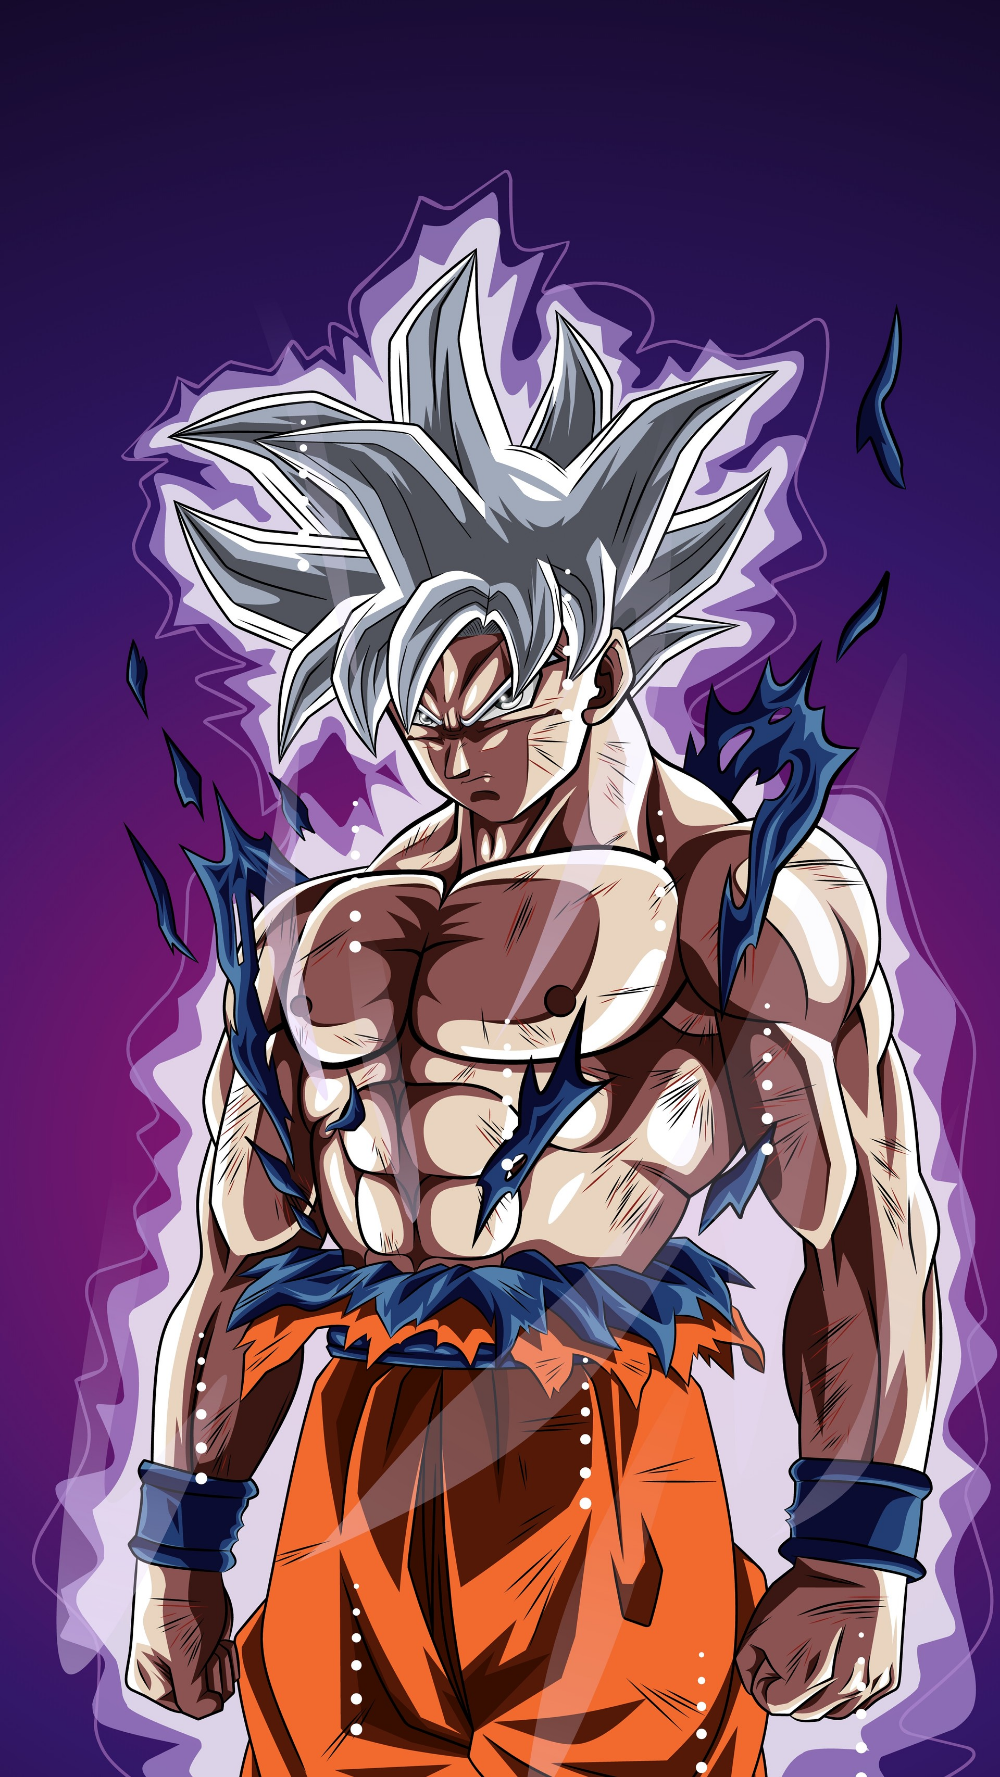 Artstation Son Goku Mastered Ultra Instinct Still Alive Artworks Anime Dragon Ball Goku Dragon Ball Super Artwork Anime Dragon Ball Super